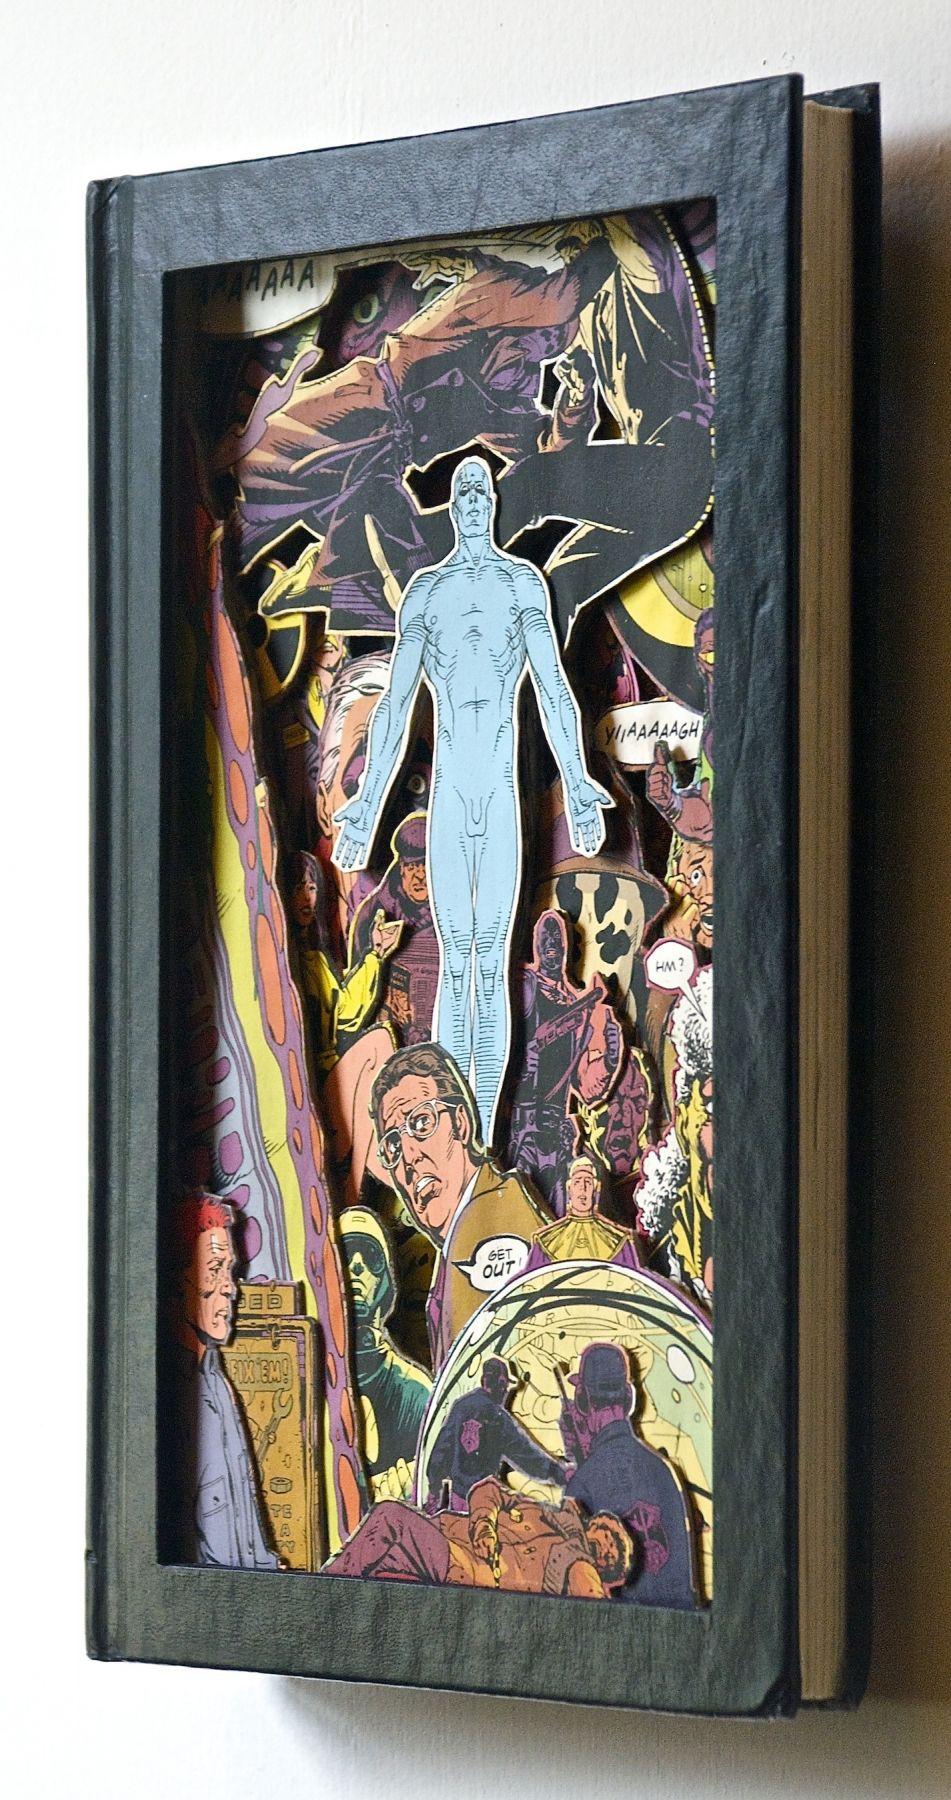 TONY DAGRADI, Ascension - Watchmen (side view),2018